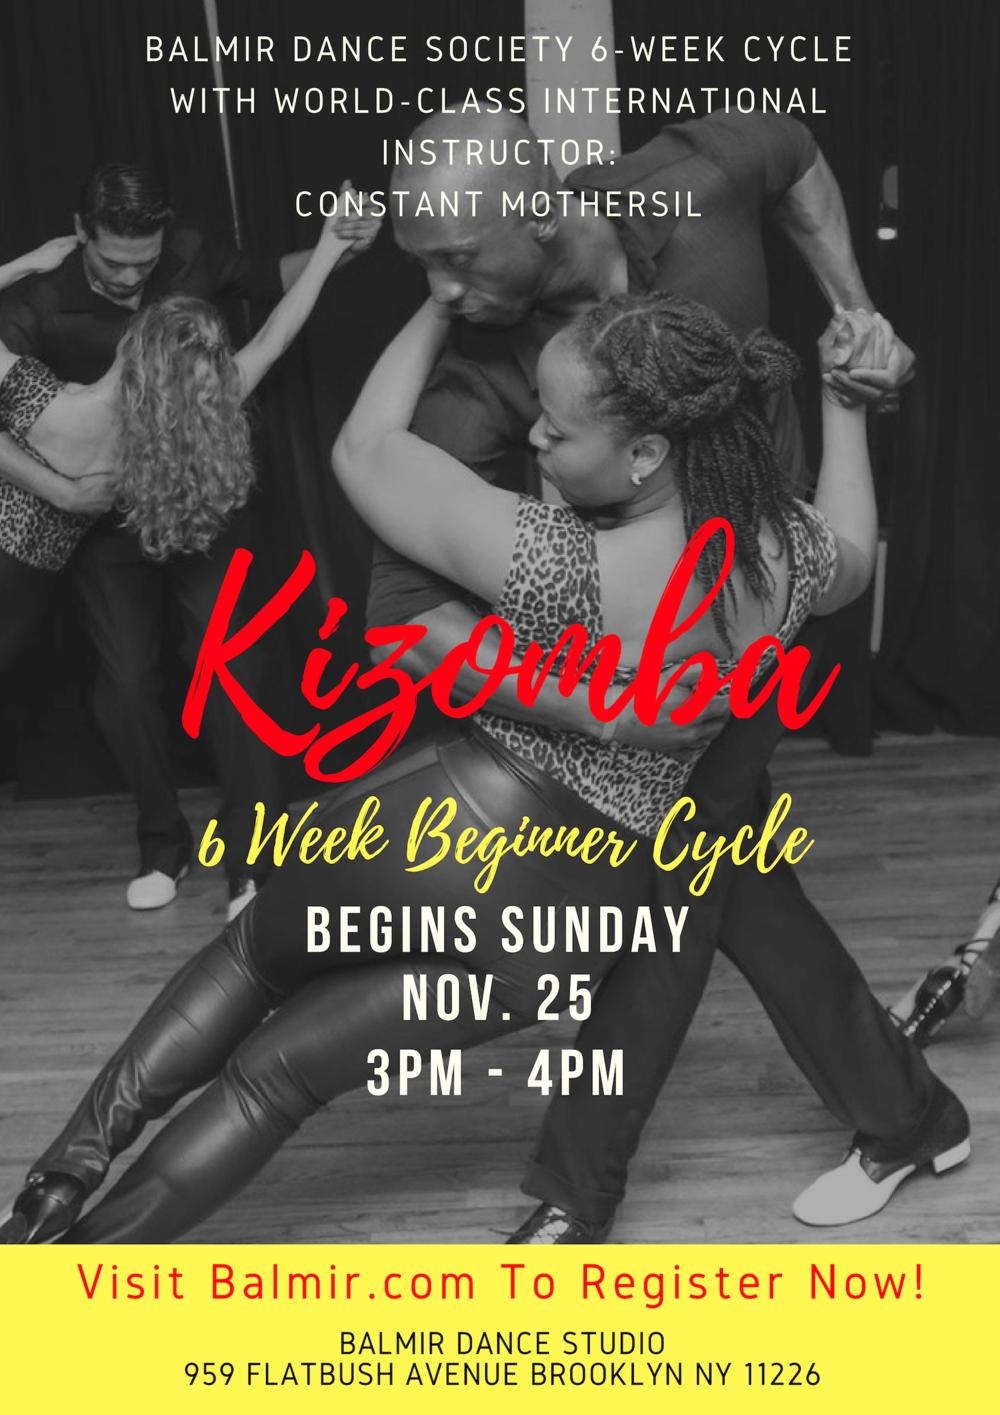 Kizomba 6 Week Cycle Brooklyn Dance Classes Balmir.png